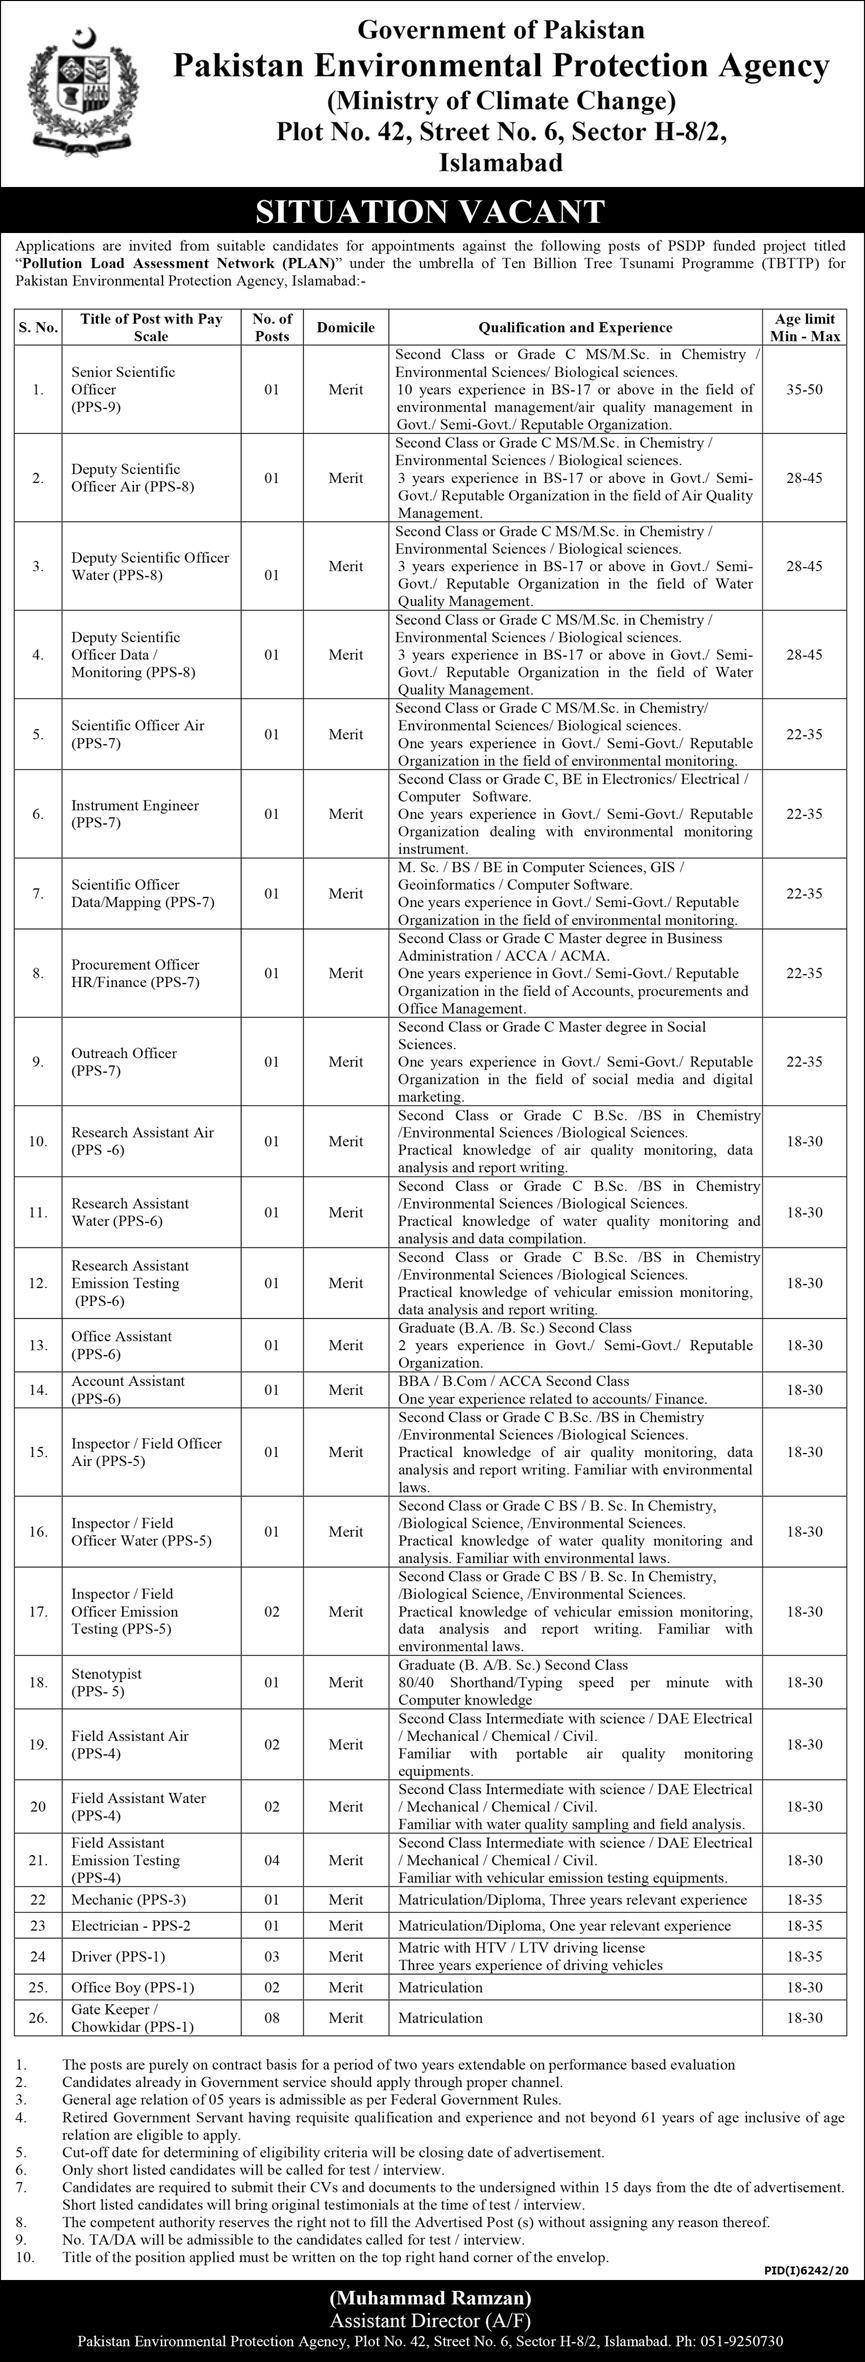 Latest Ten Billion Tree Tsunami Programme TBTTP, Ministry of Climate Change, Pakistan Environmental Protection Agency PEPA, Government of Pakistan Jobs 2021